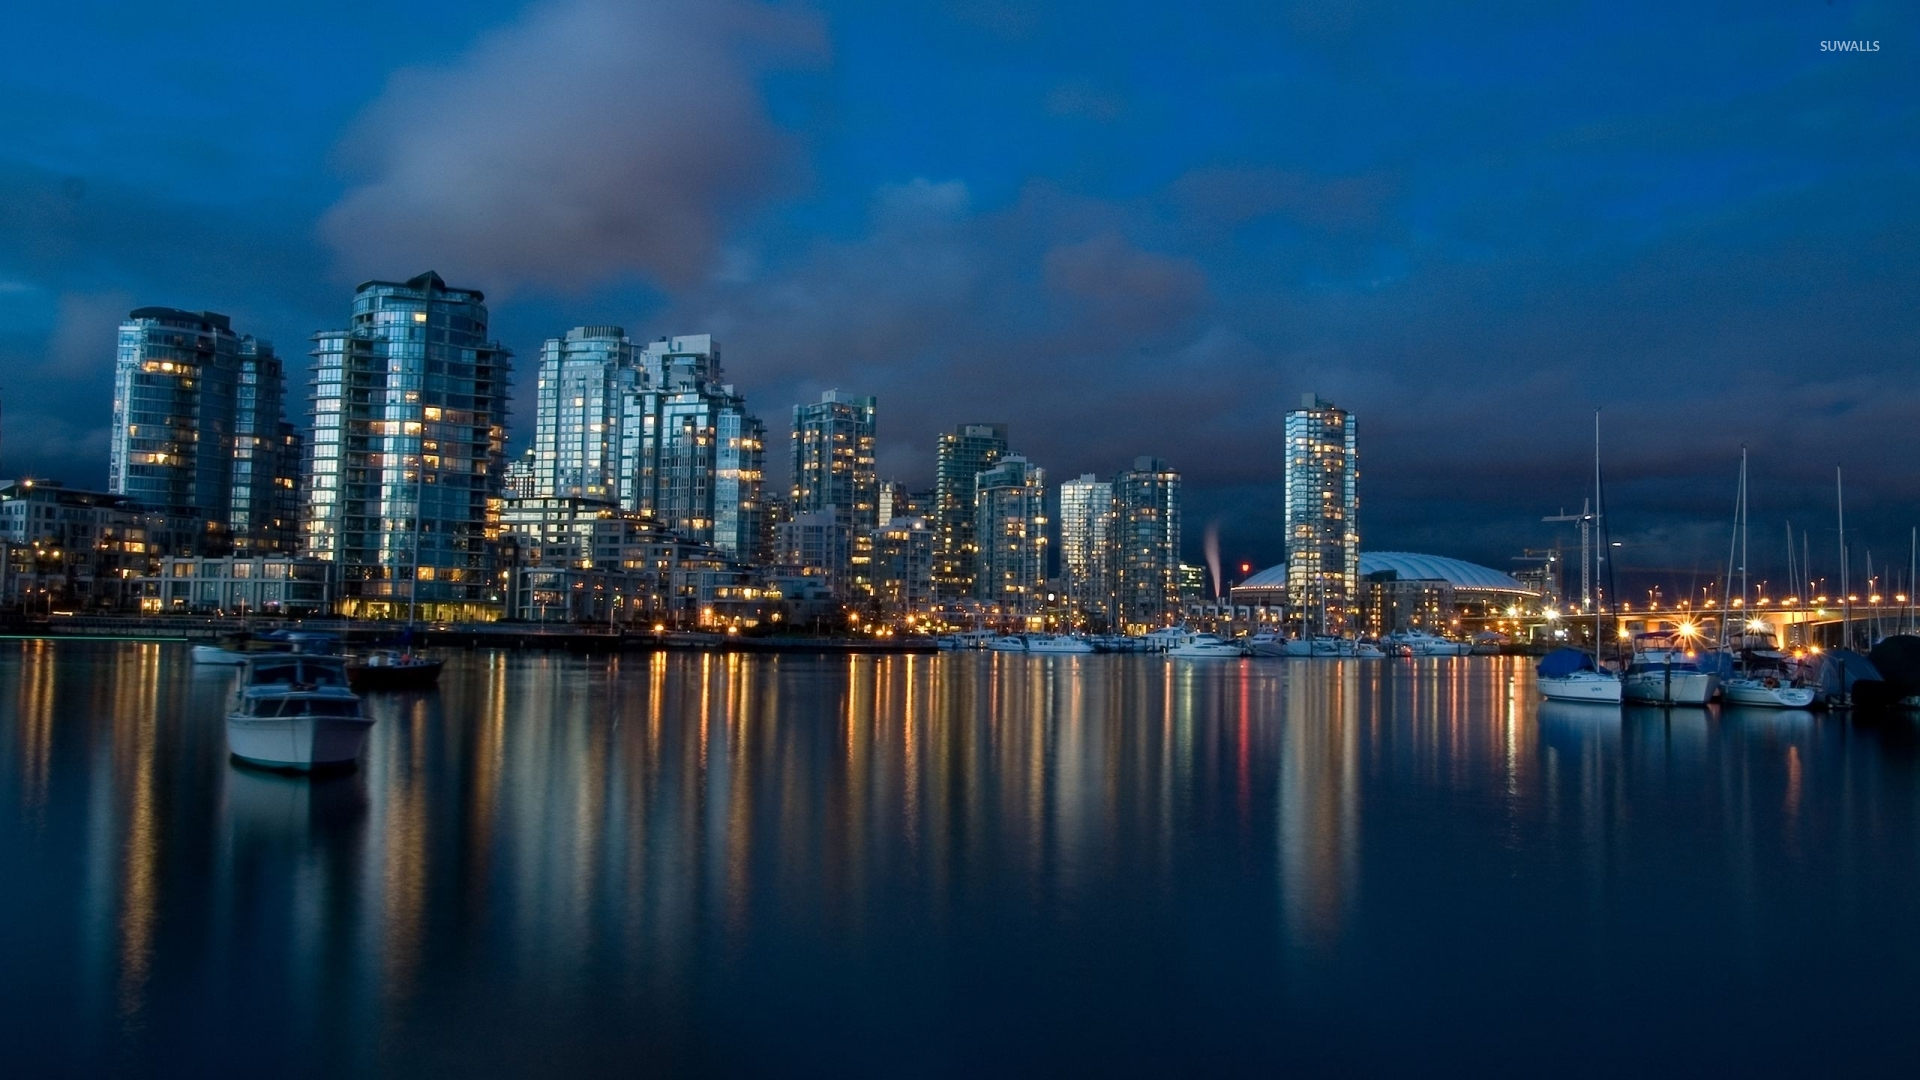 Vancouver 3 Wallpaper